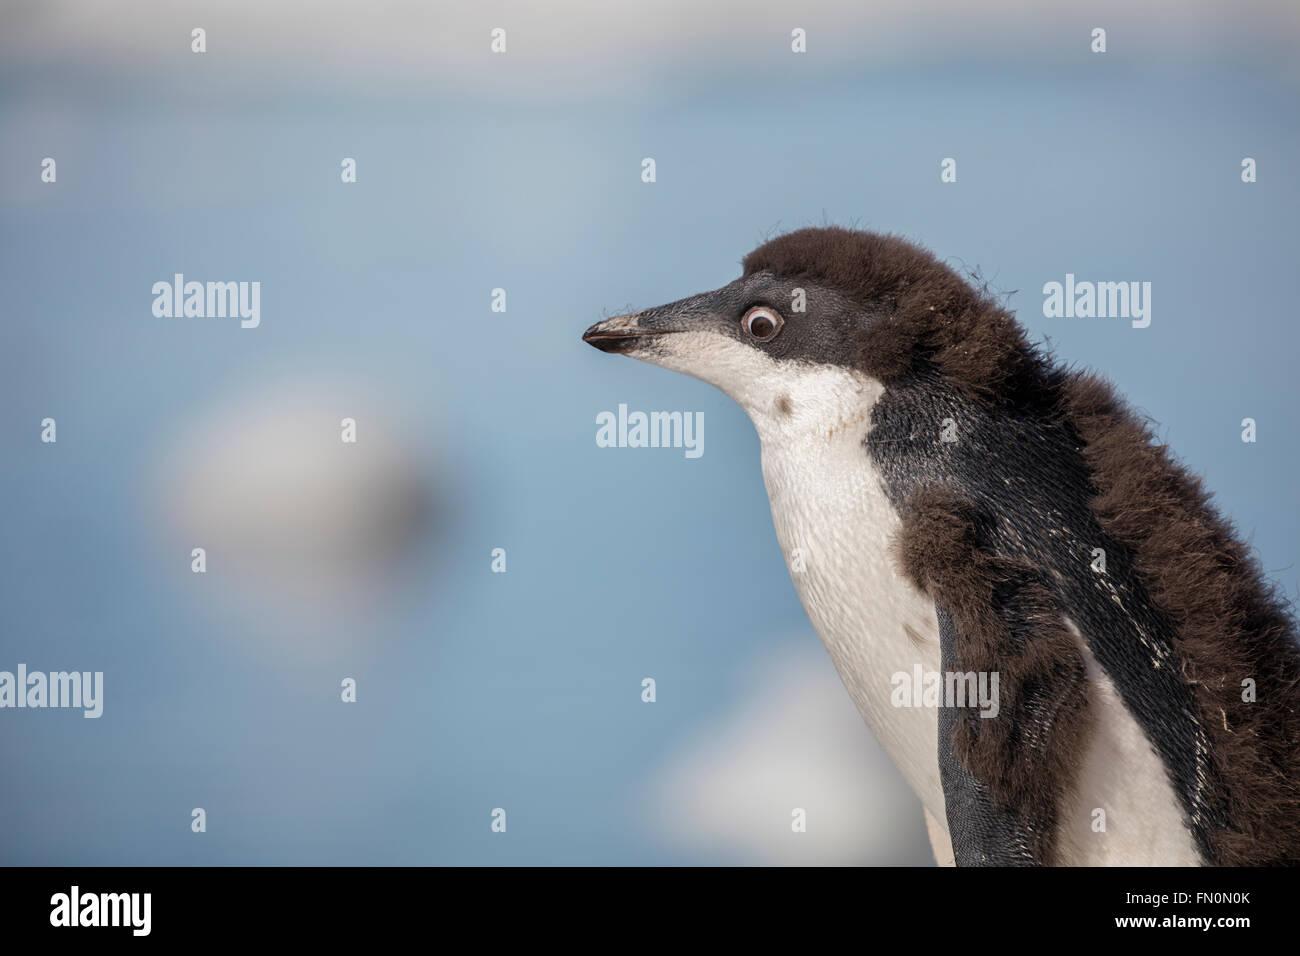 Antarctica, Antarctic peninsula, Brown Bluff. Adelie penguin, chicknature - Stock Image